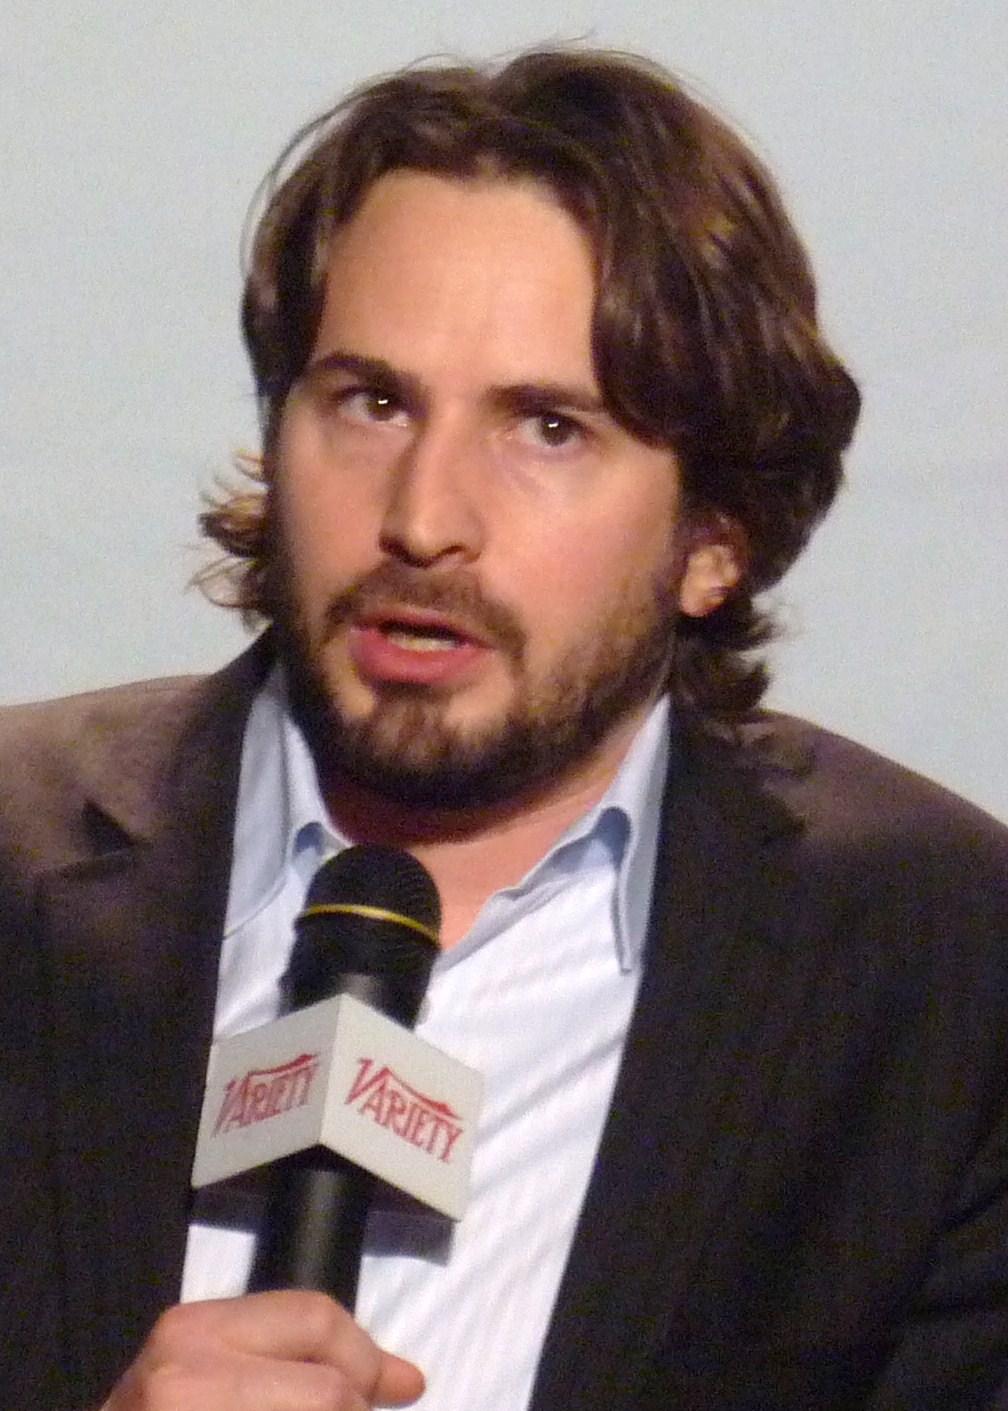 Mark Boal